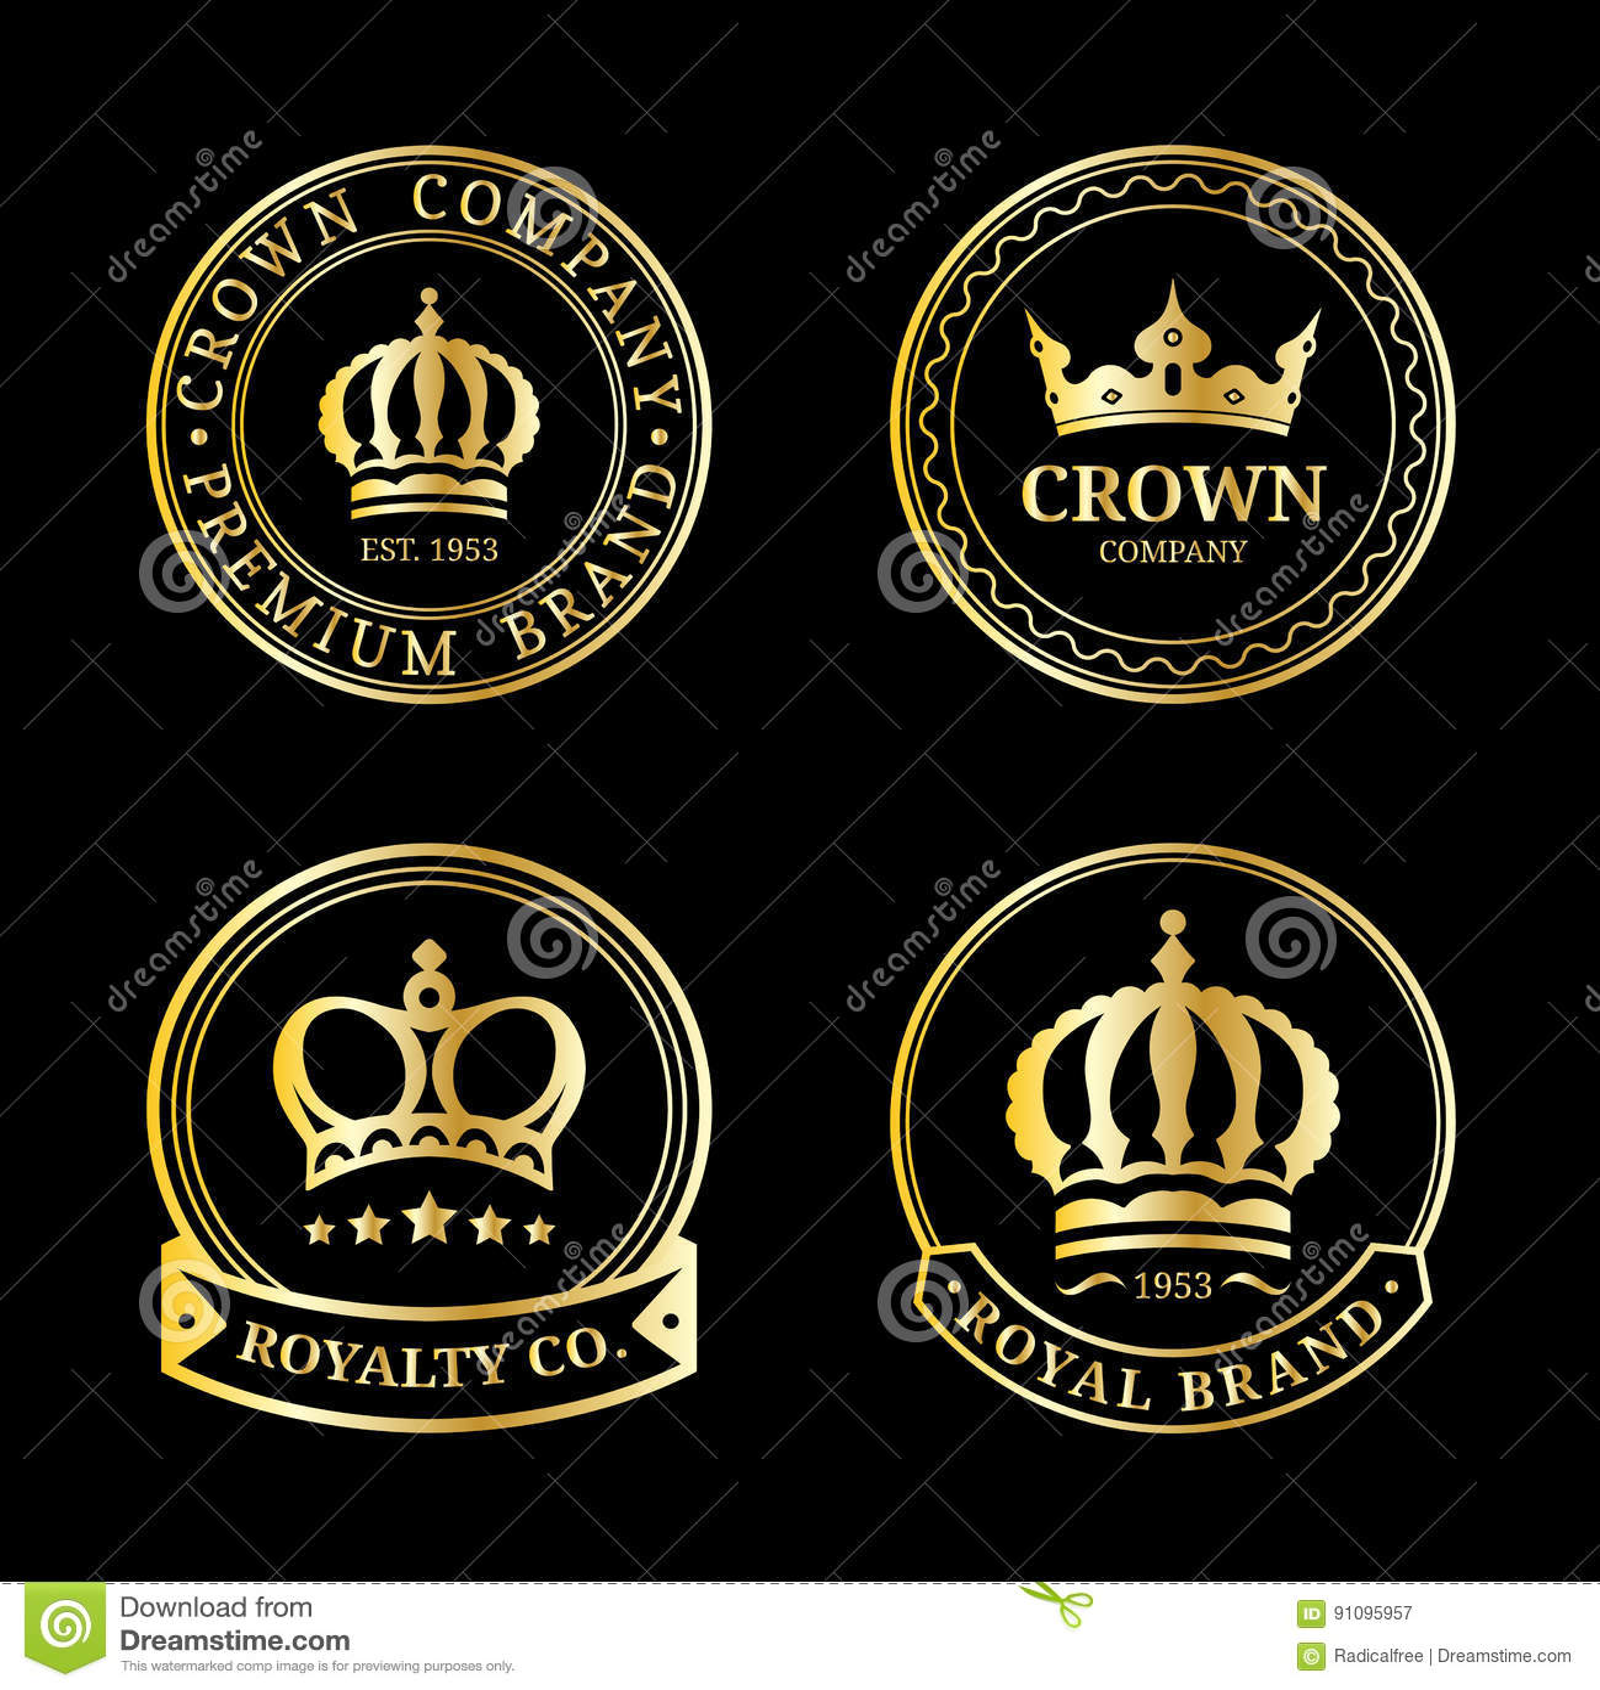 vector crown logos set luxury corona monograms design diadem icons